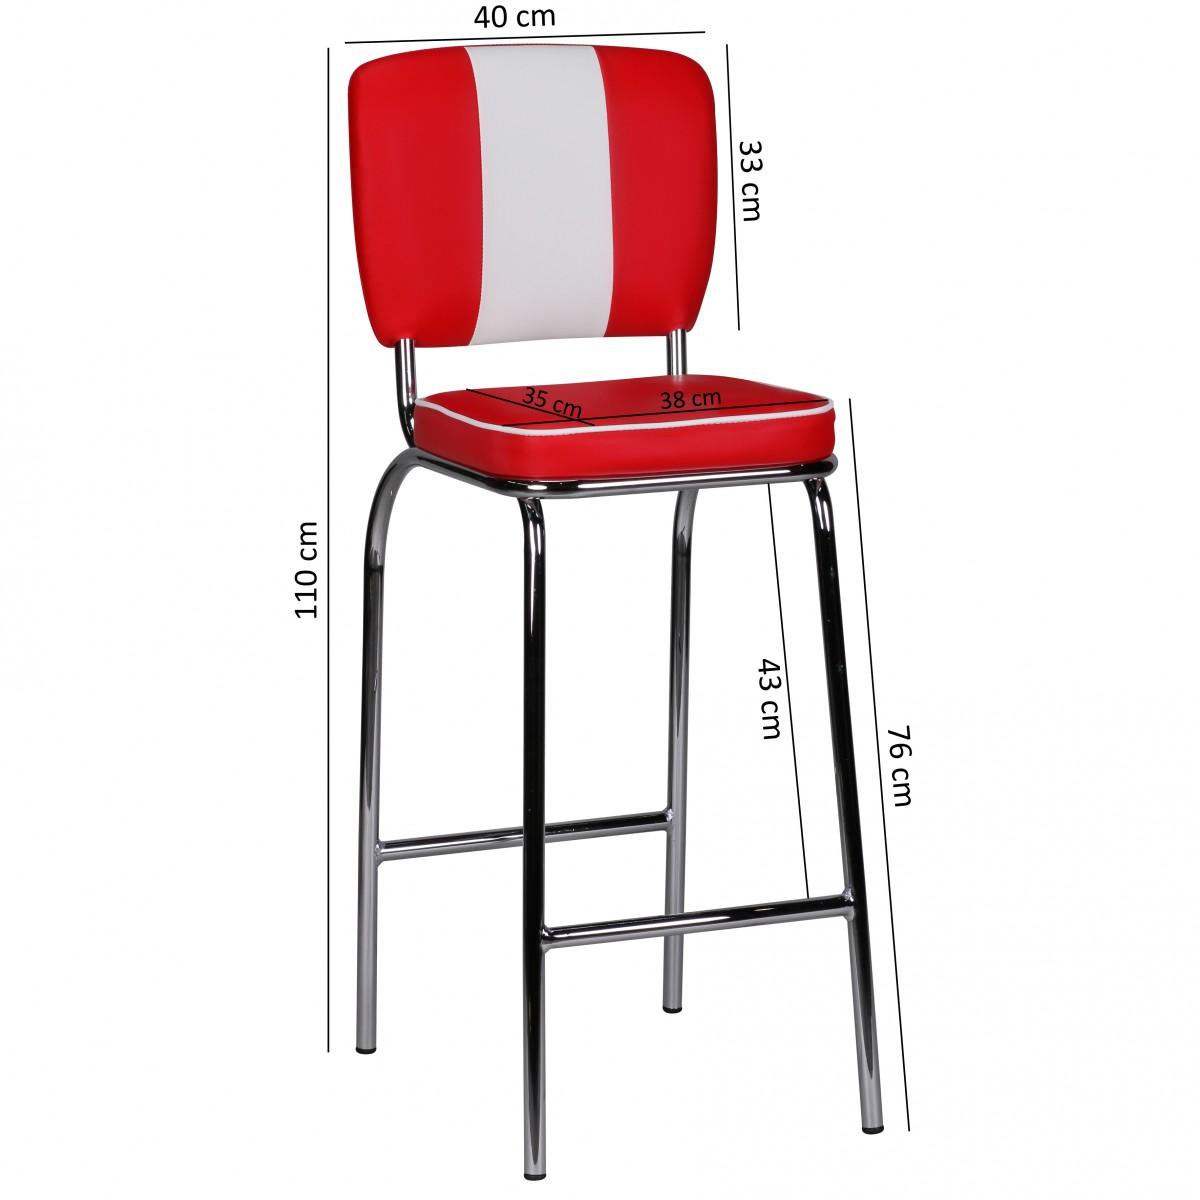 wohnling barstool am ricain 50s diner bar tabouret de bar retro rouge blanc neuf ebay. Black Bedroom Furniture Sets. Home Design Ideas